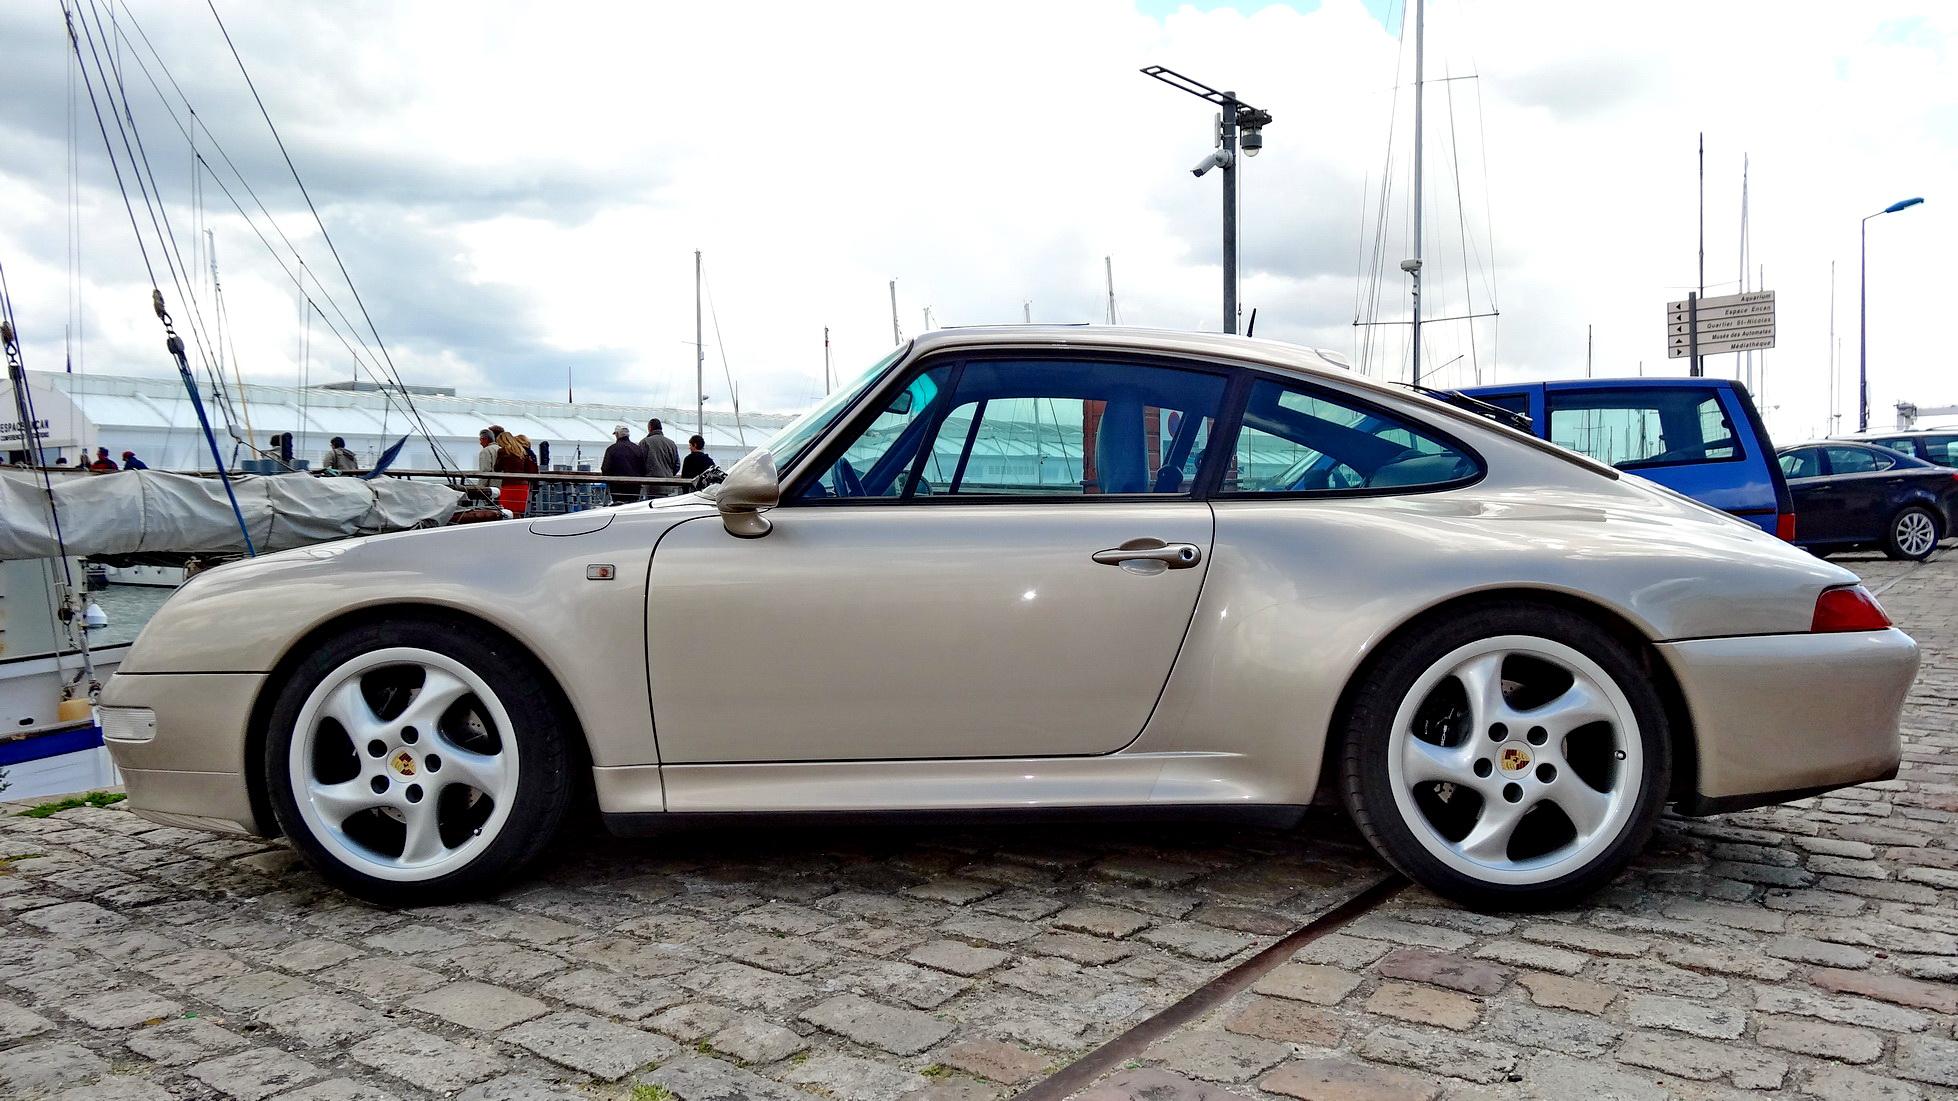 993 S Porsche Paladio